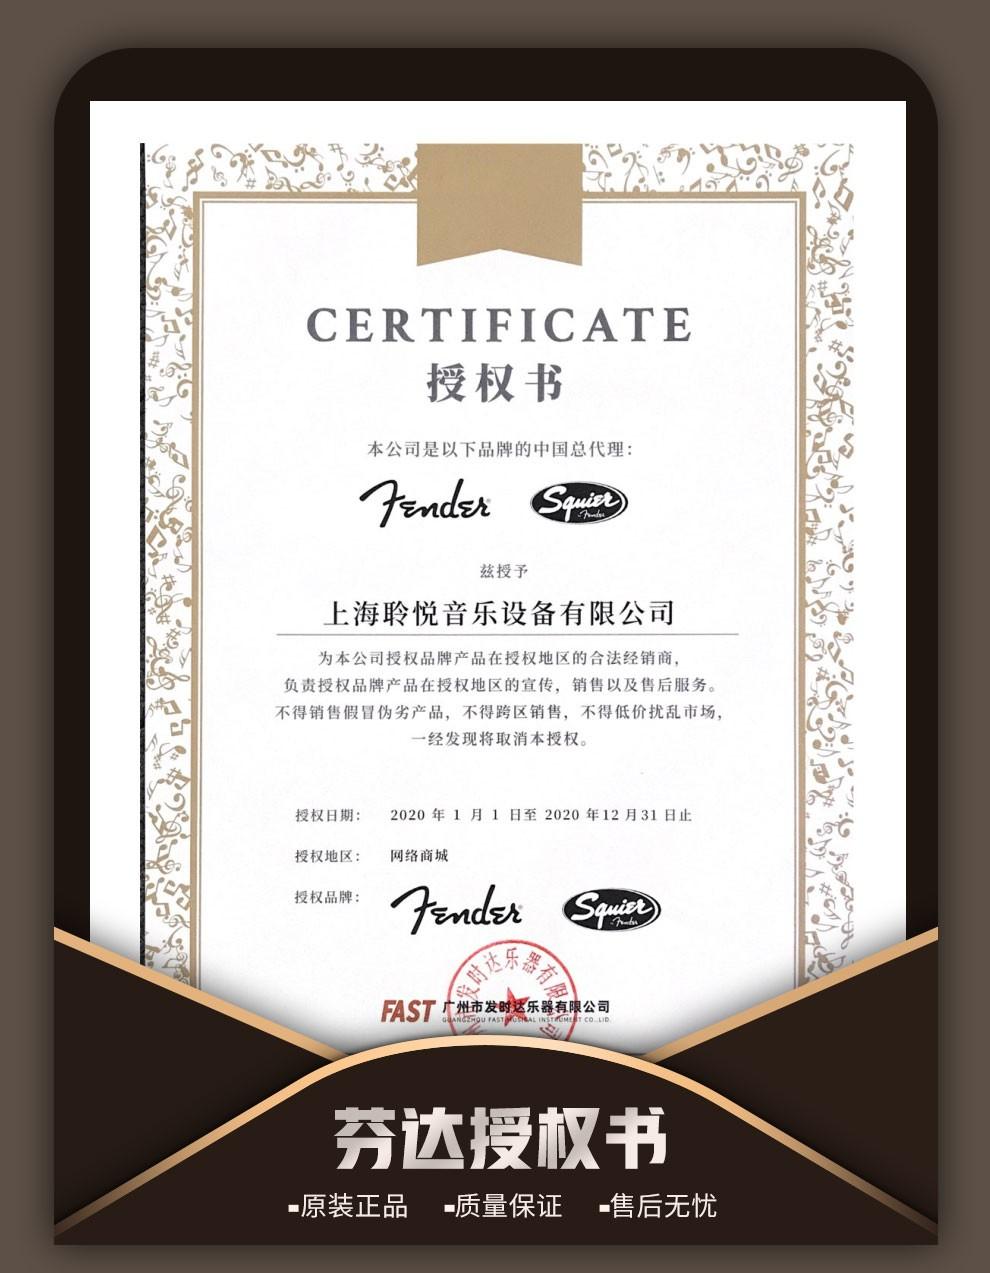 FENDER 芬達吉它音響Fender champion20 40 100電吉他音箱帶效果 champion (100瓦)(尚雲居)